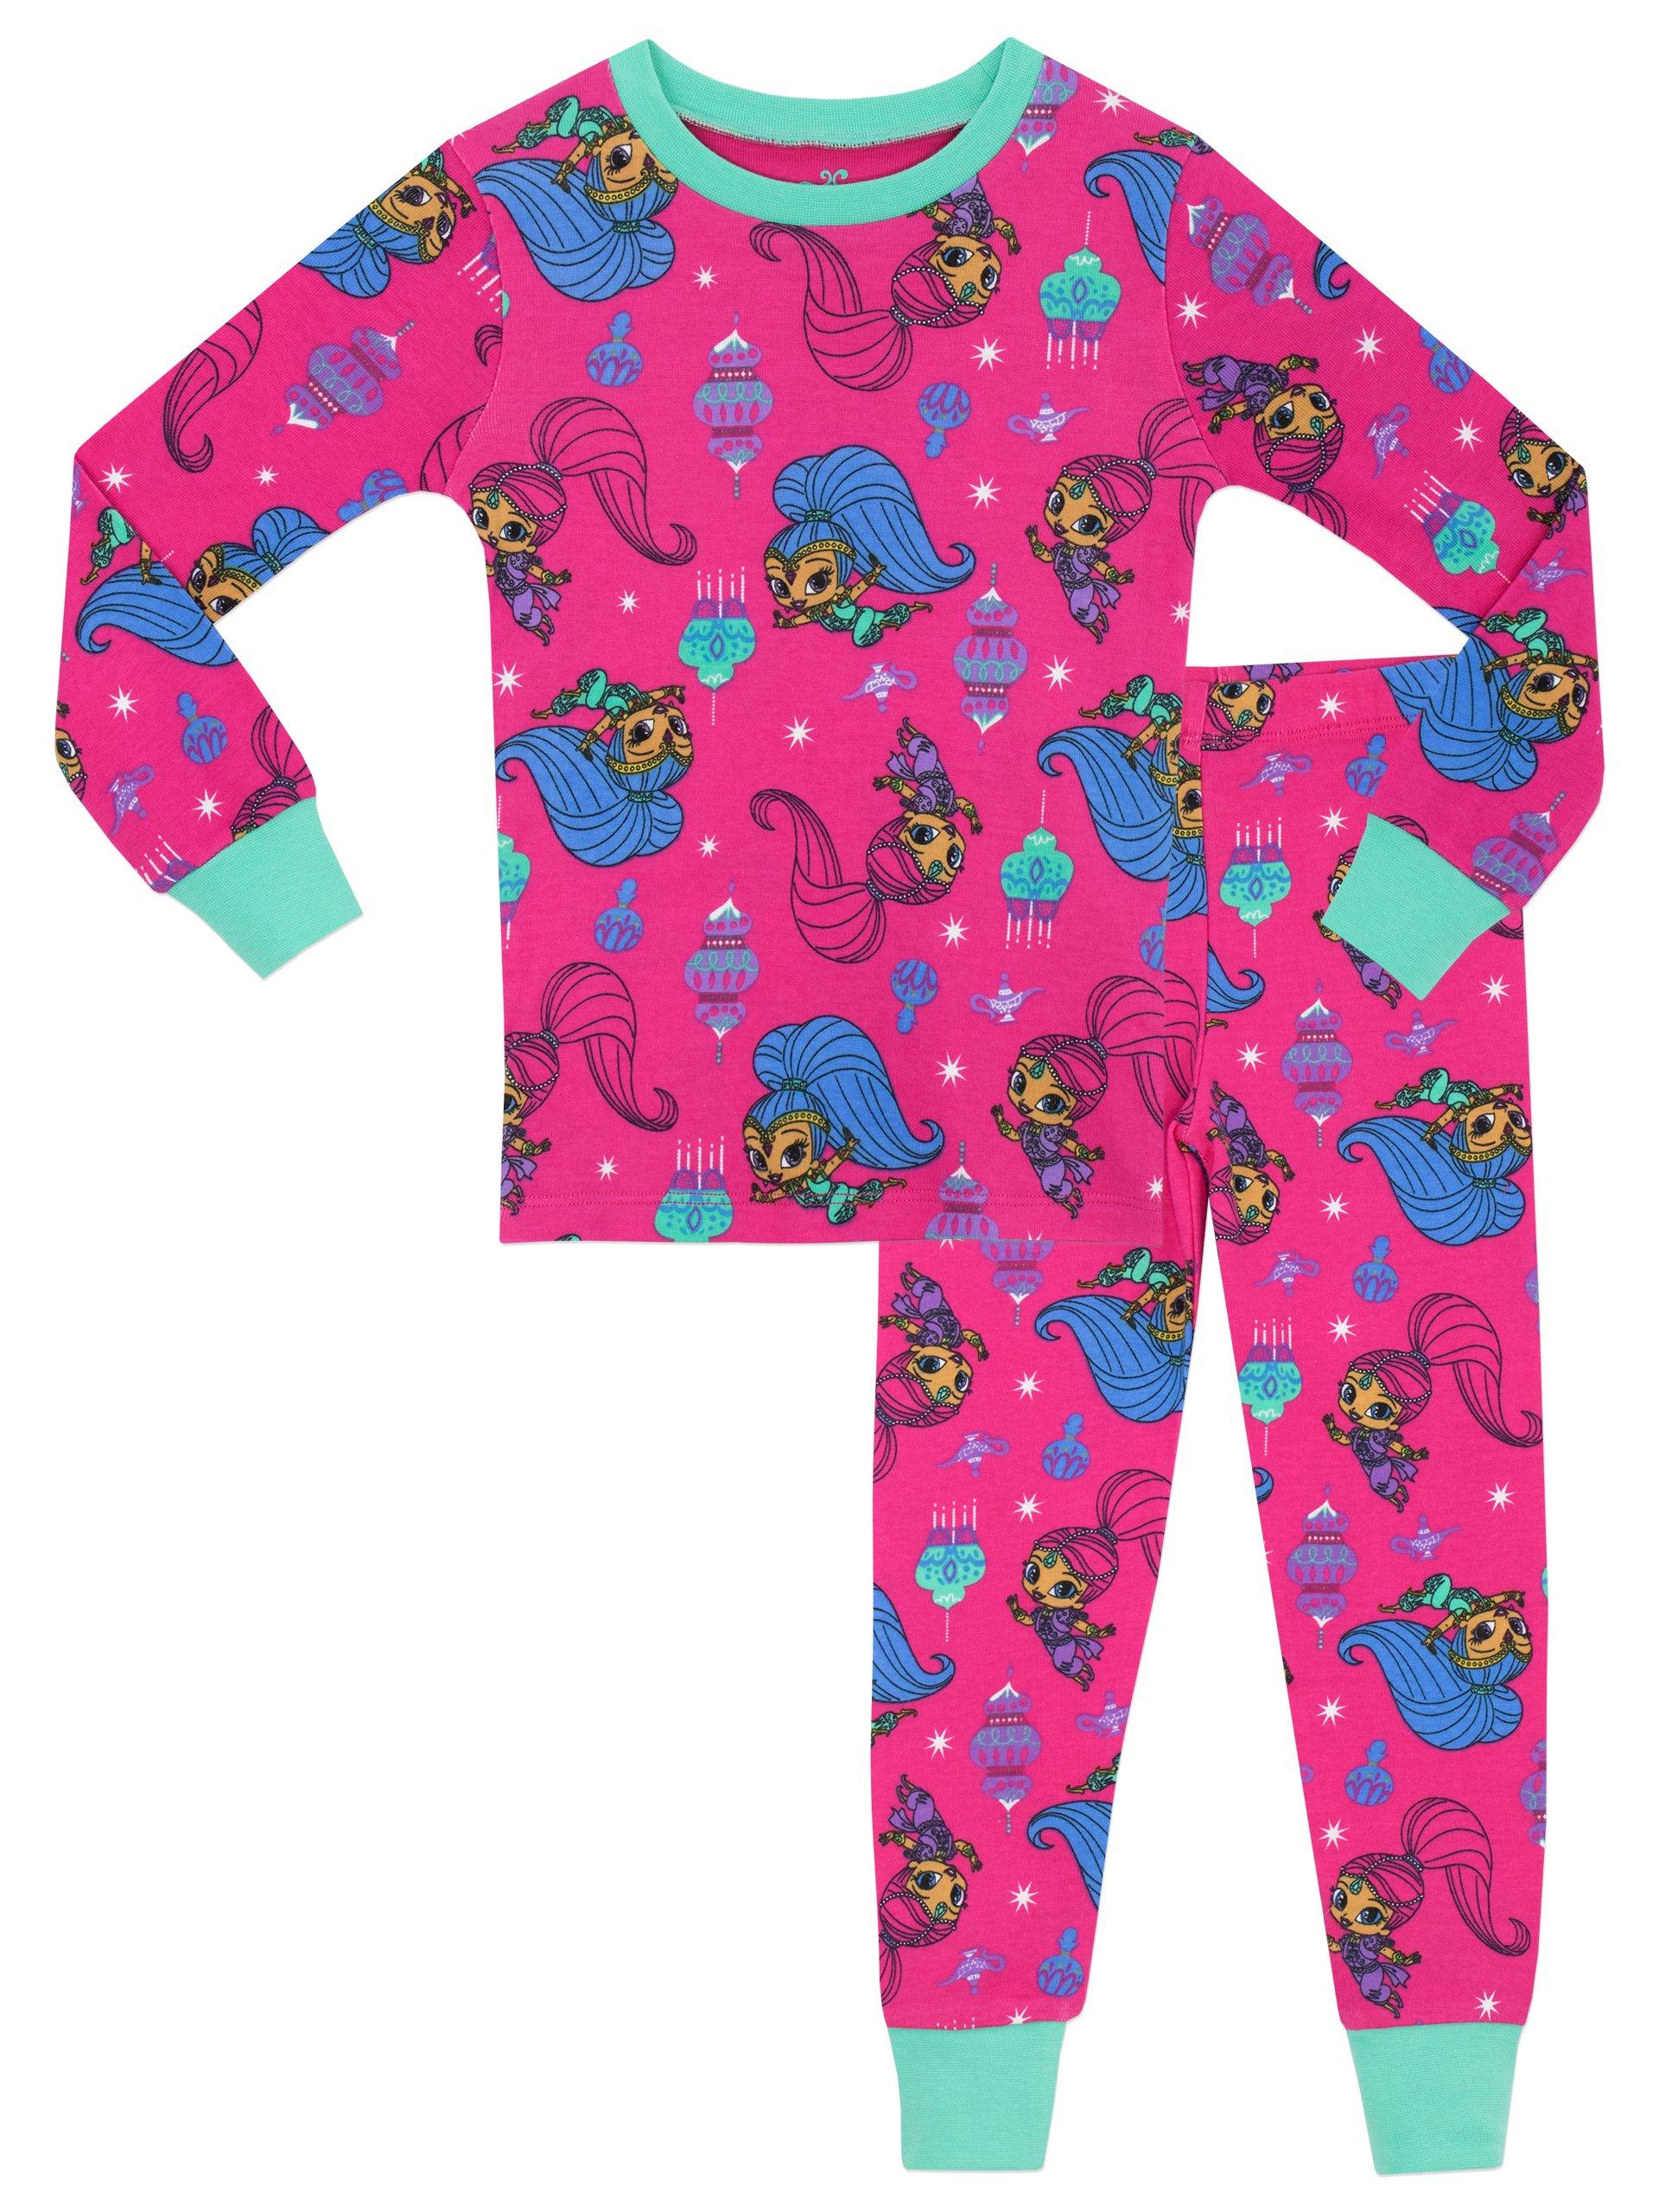 Shimmer and Shine Shimmer & Shine Girls Pajamas 5